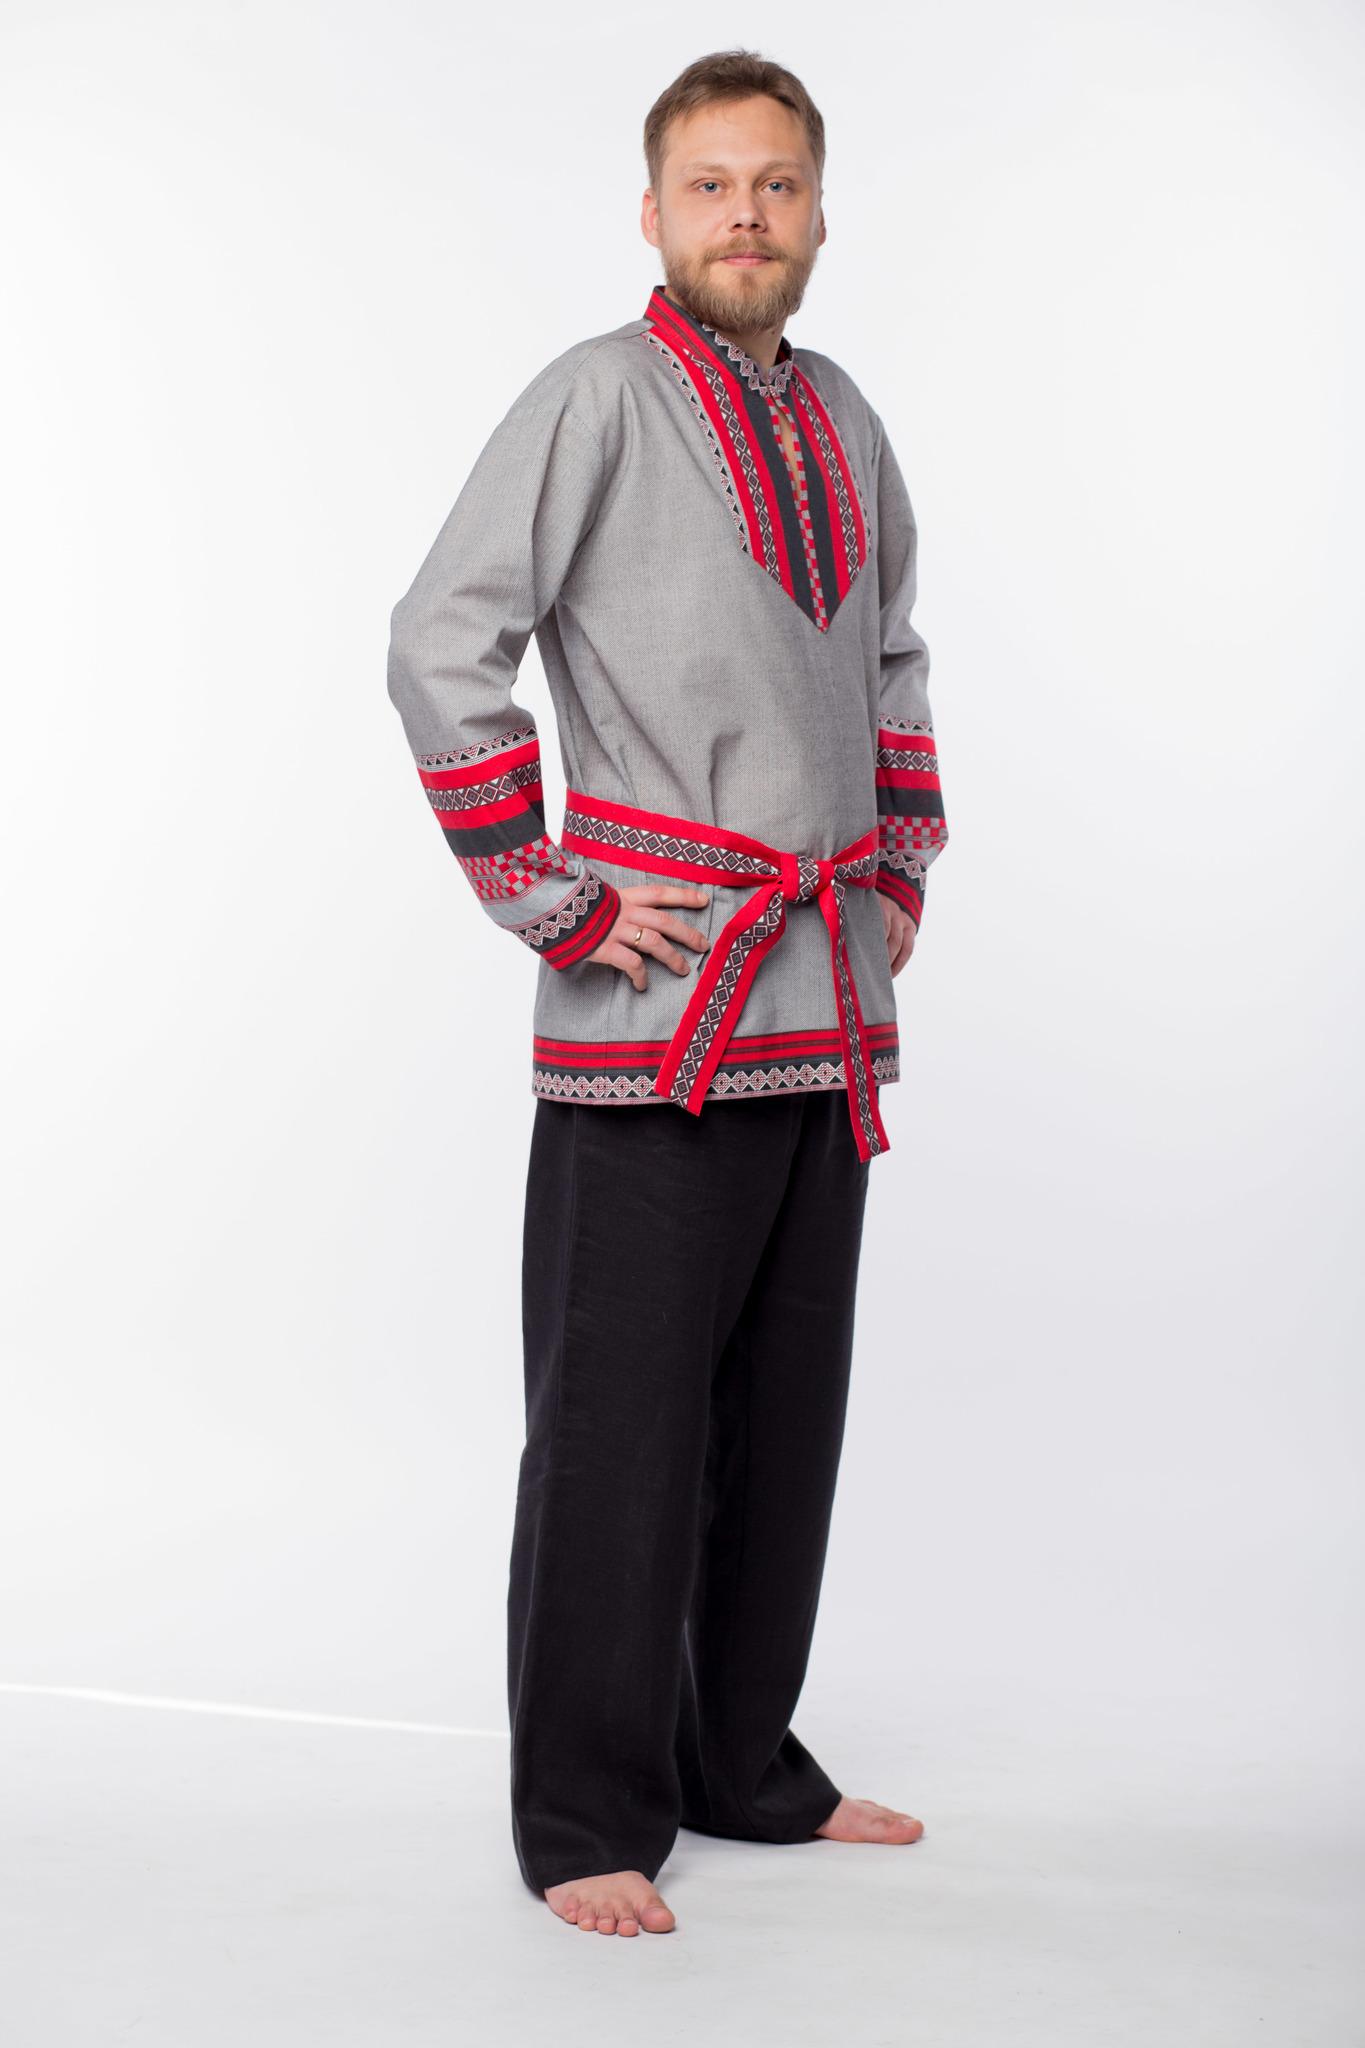 Мужская рубаха Чалдоны вид сбоку